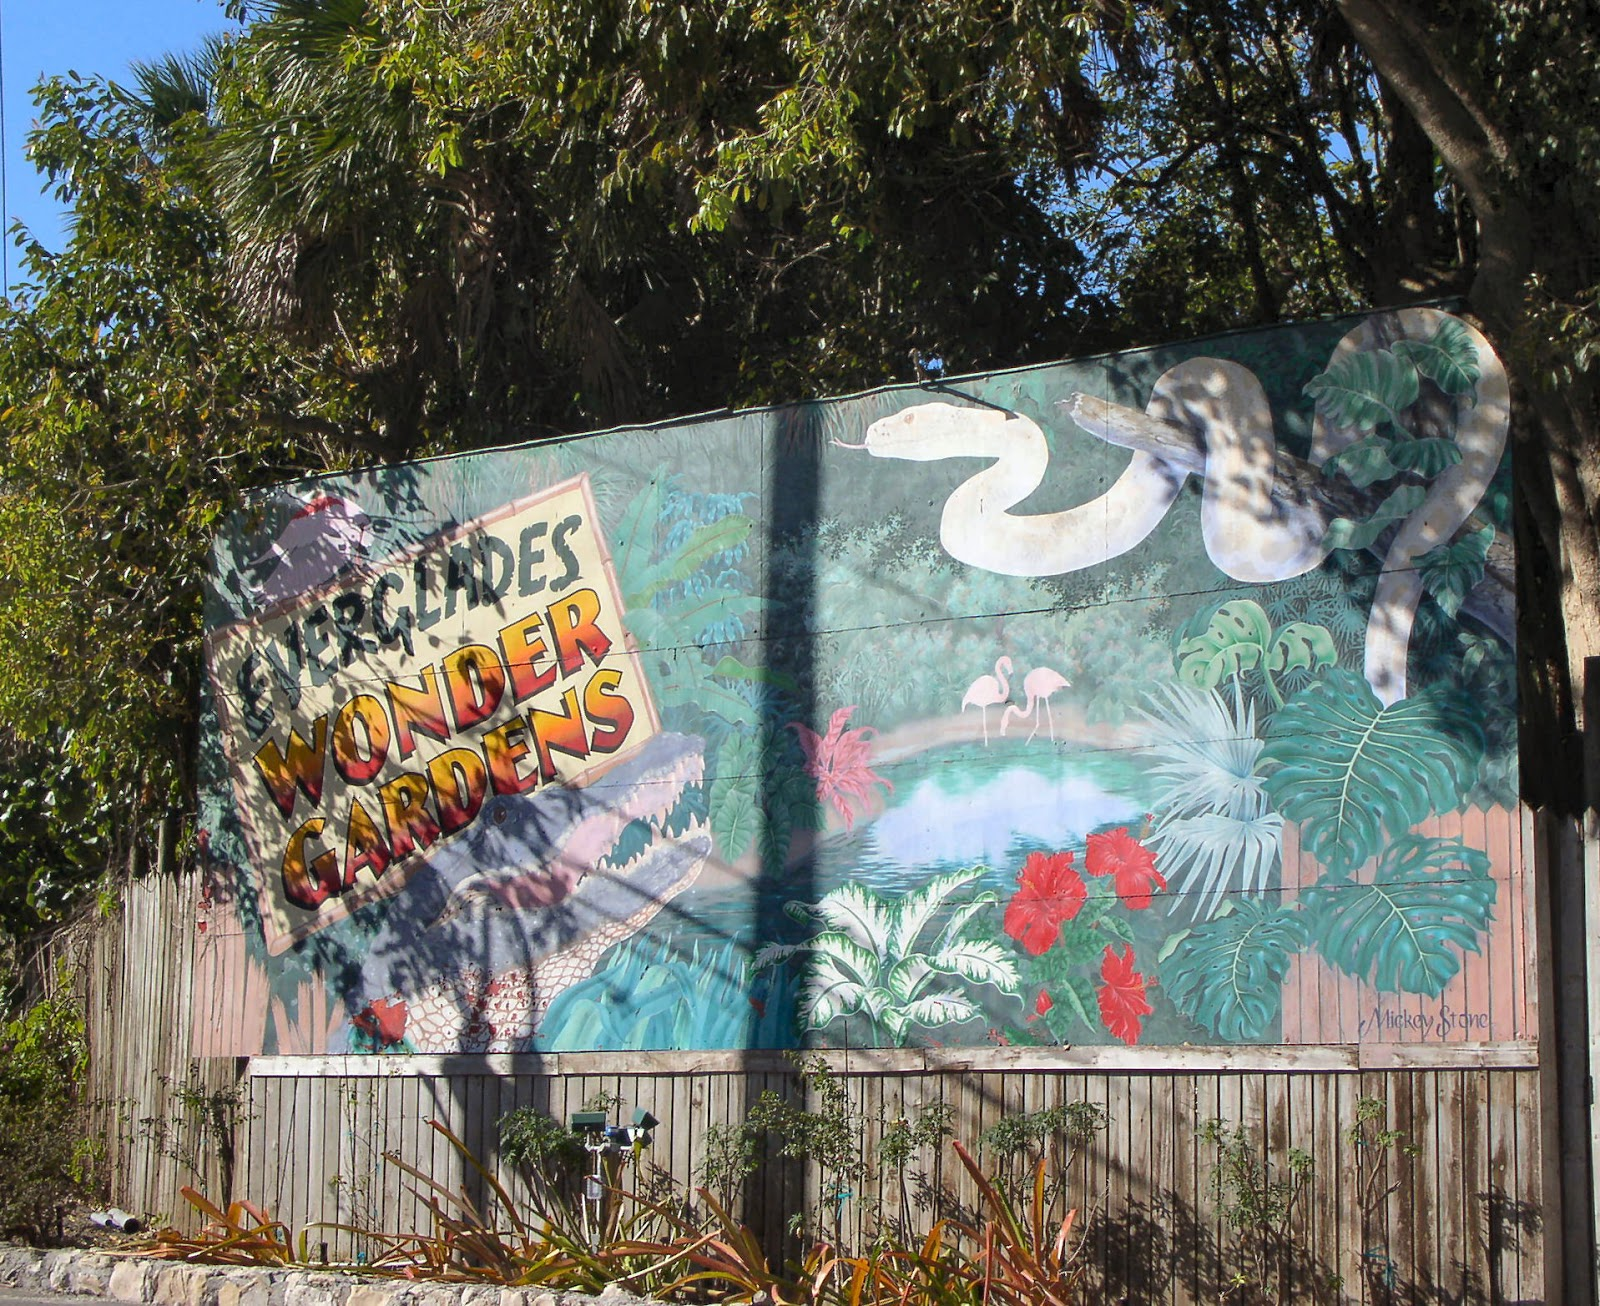 Florida Flowers And Gardens Everglades Wonder Gardens In Bonita Springs